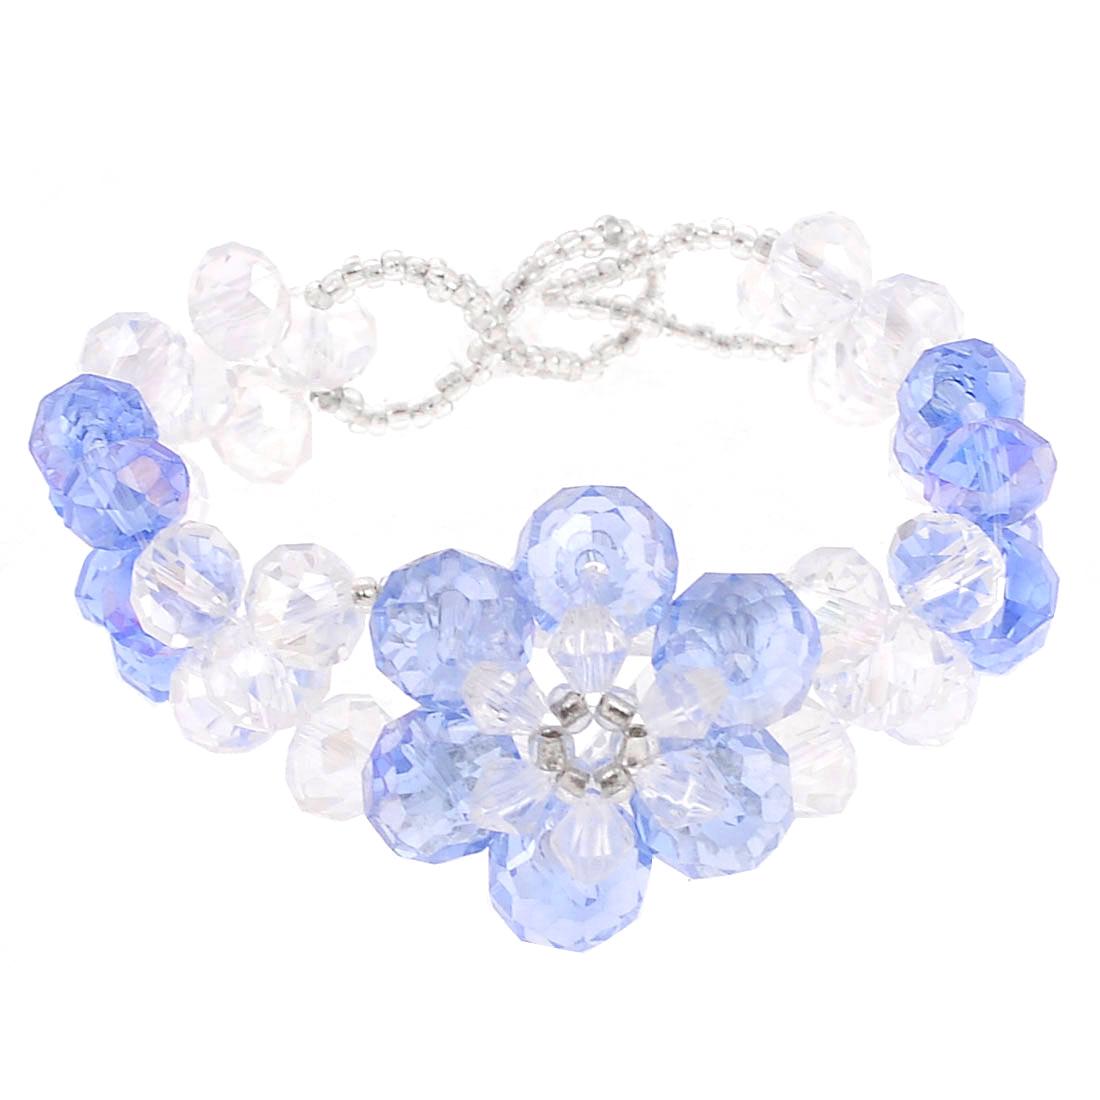 Light Blue Clear Plastic Rhombus Printed Crystal Linked Bracelet